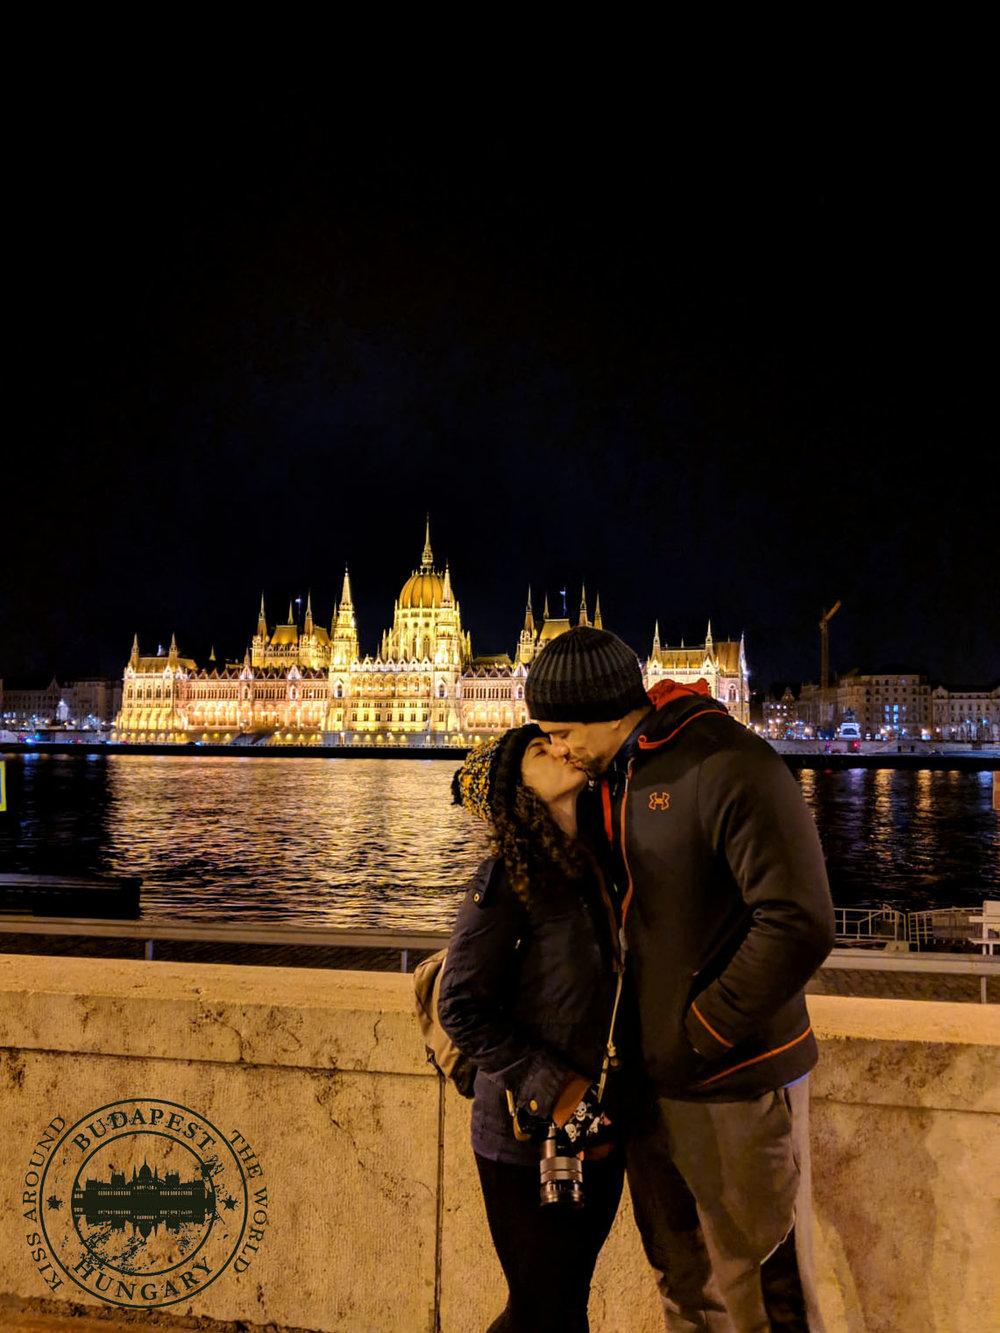 budapest_kiss_around_the_world_vickygood_photography.jpg